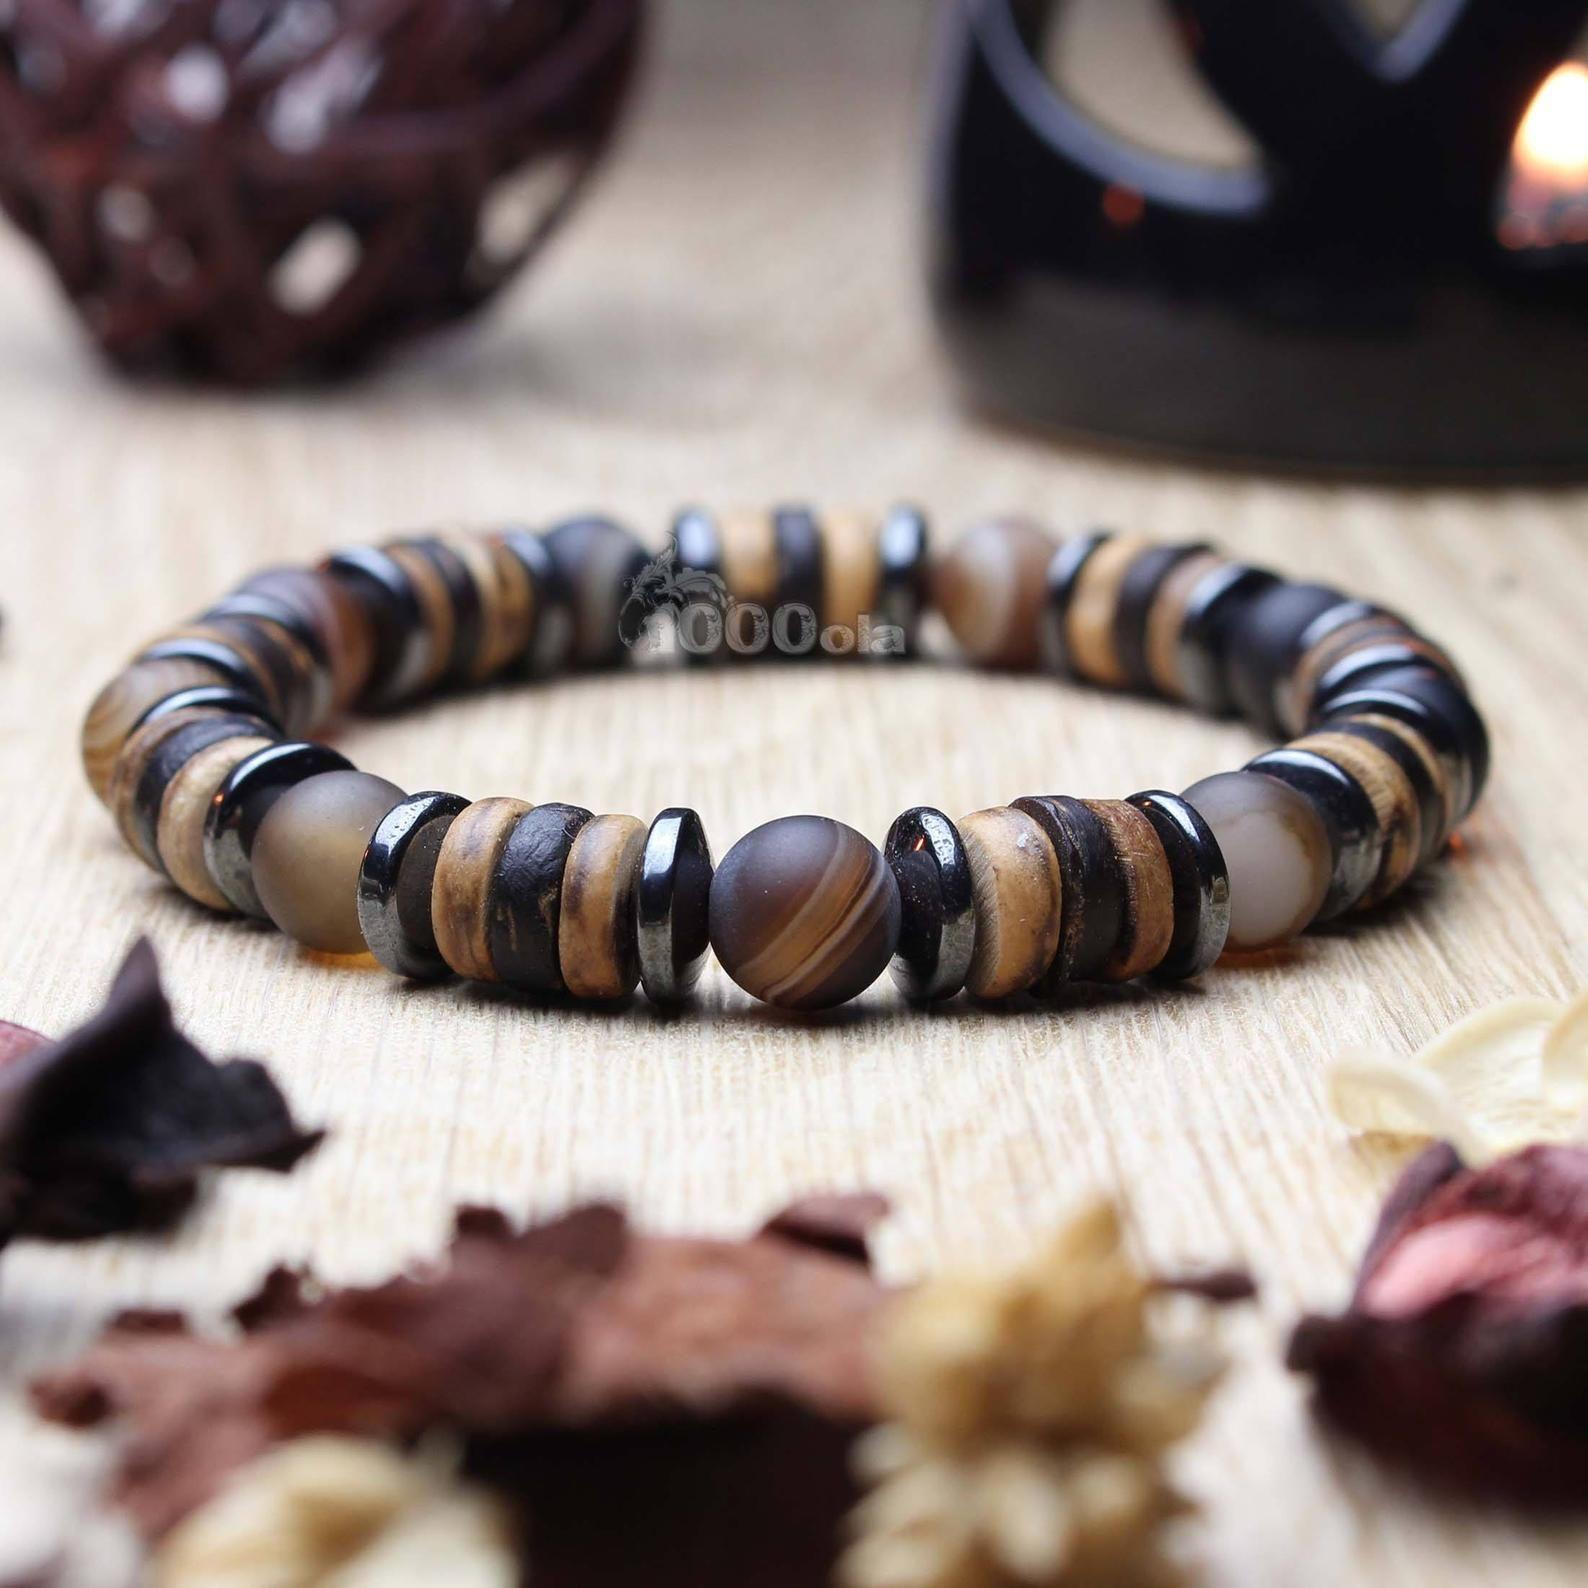 tout neuf cbbfd 52c68 Beautiful men/women Bracelet beads Ø 8mm natural stone beige ...